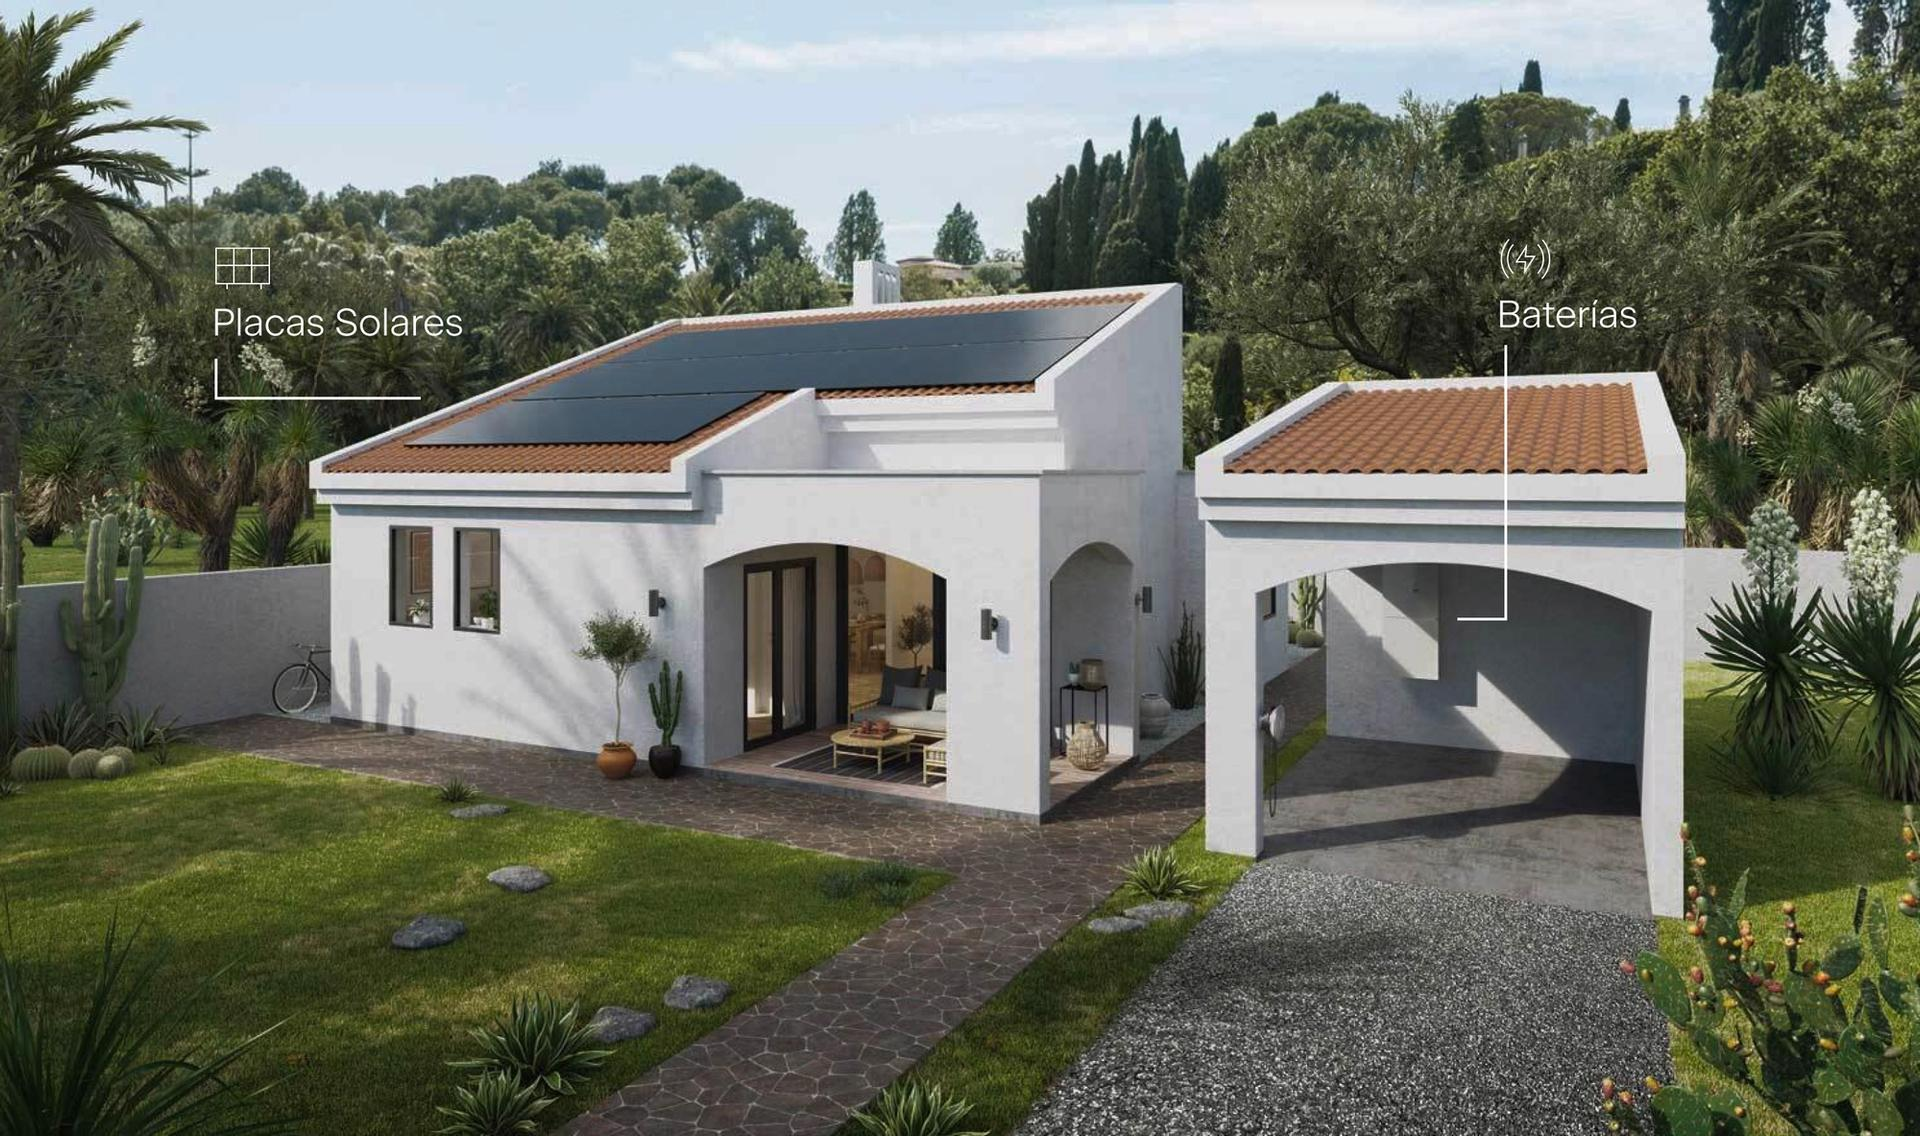 Spanish house with Svea Solar's products